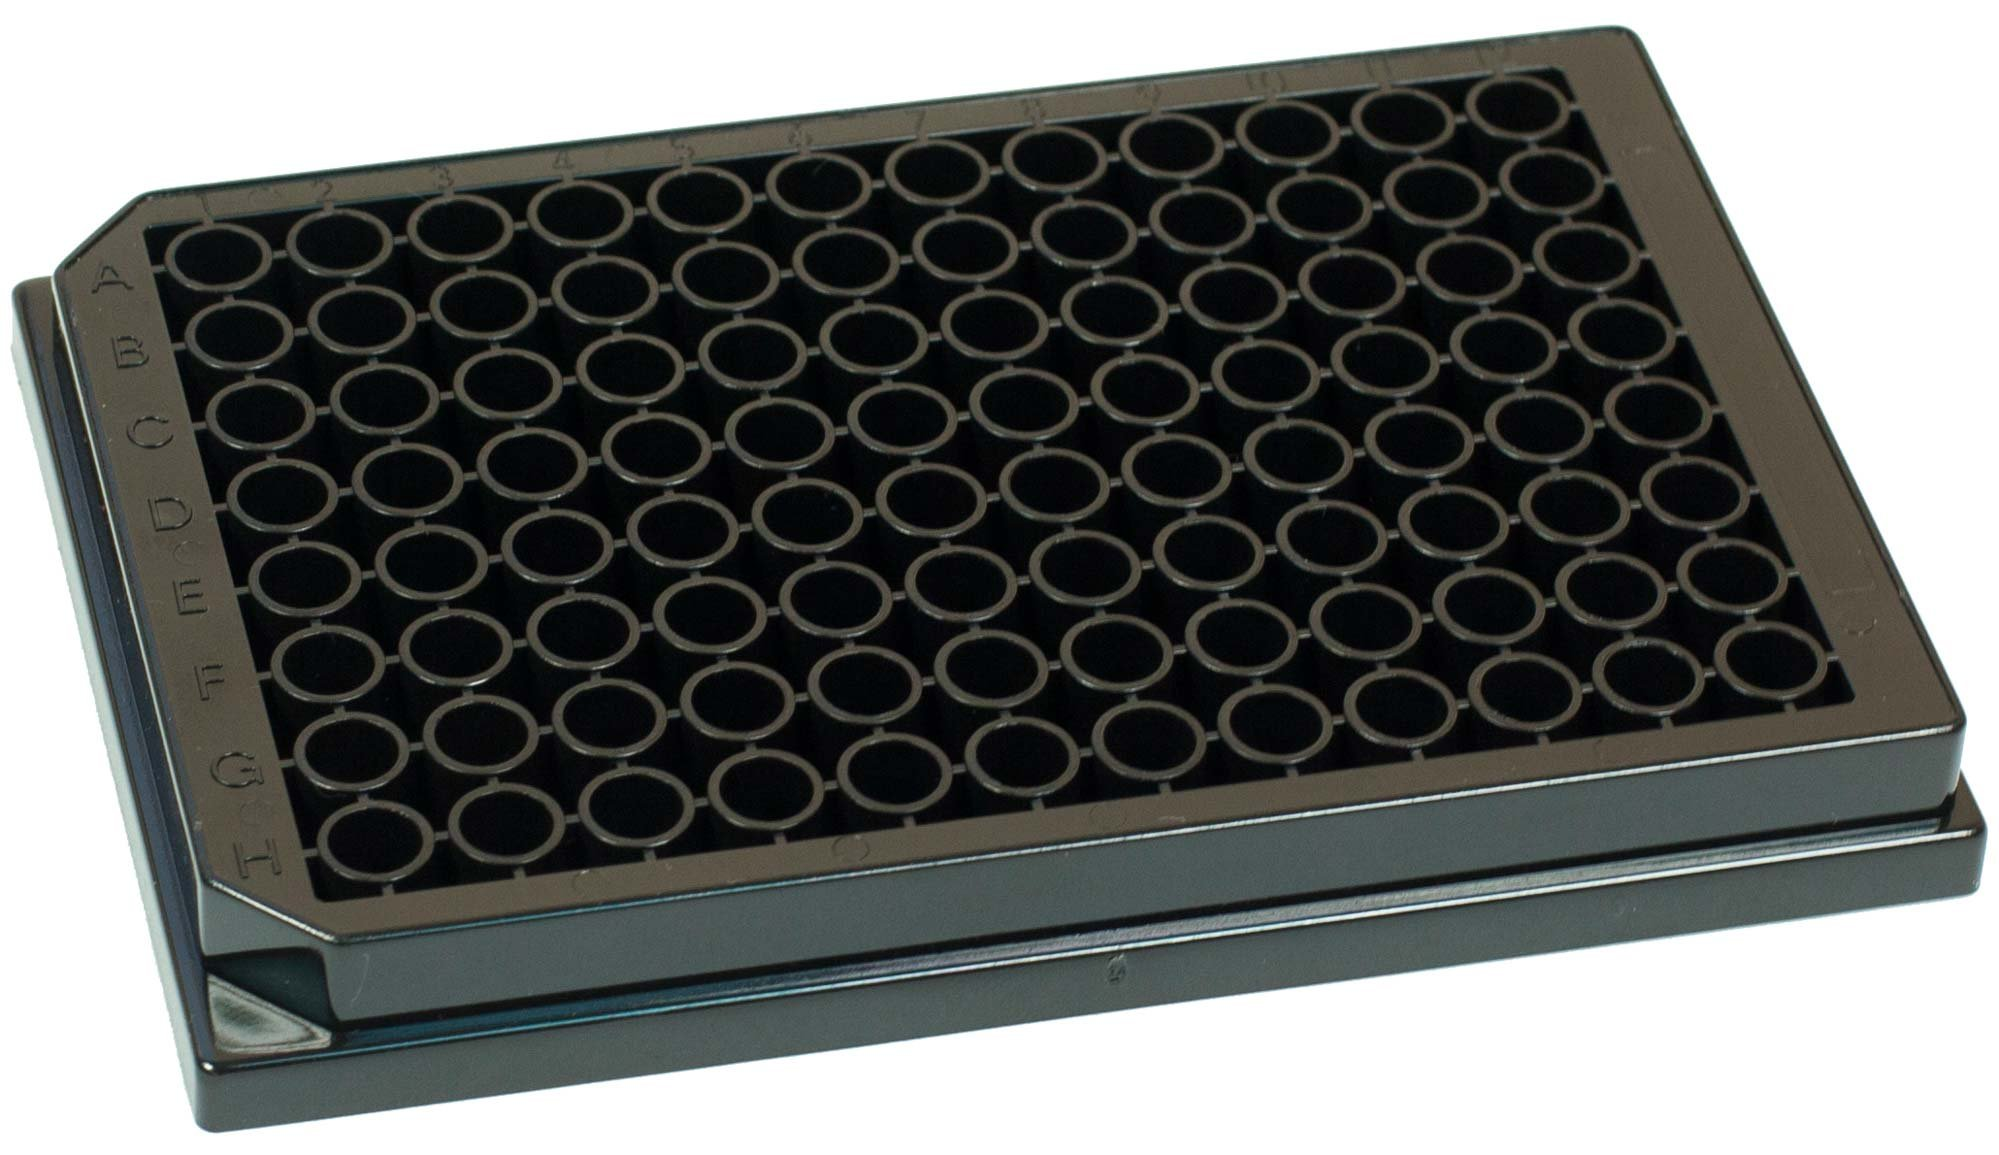 BRANDplates lipoGrade Non-Sterile Treated Surface 96-Well Plate - Black, Transparent F-Bottom